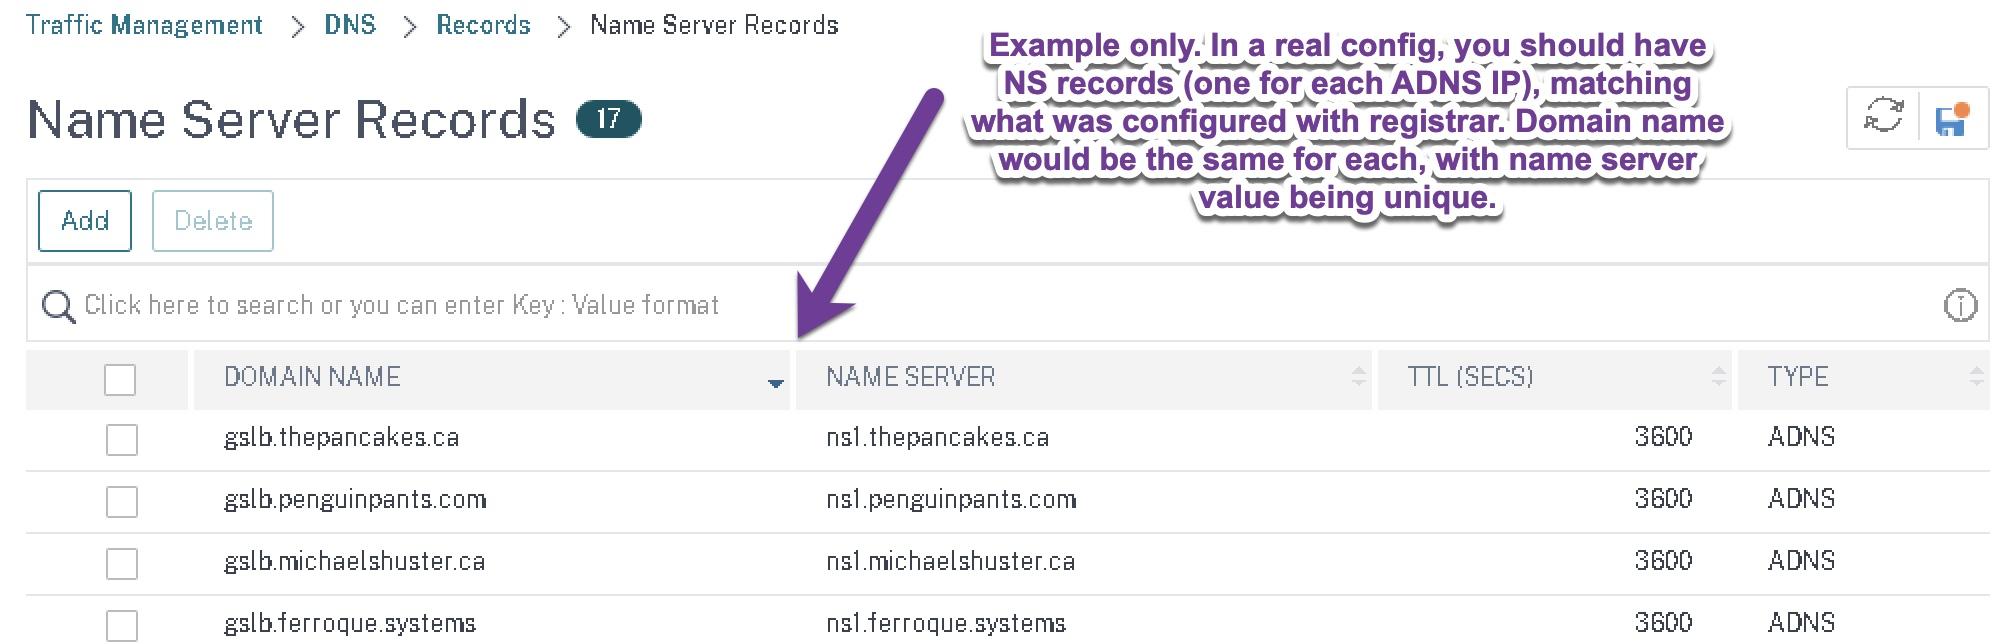 Citrix NetScaler ADC name server NS records example